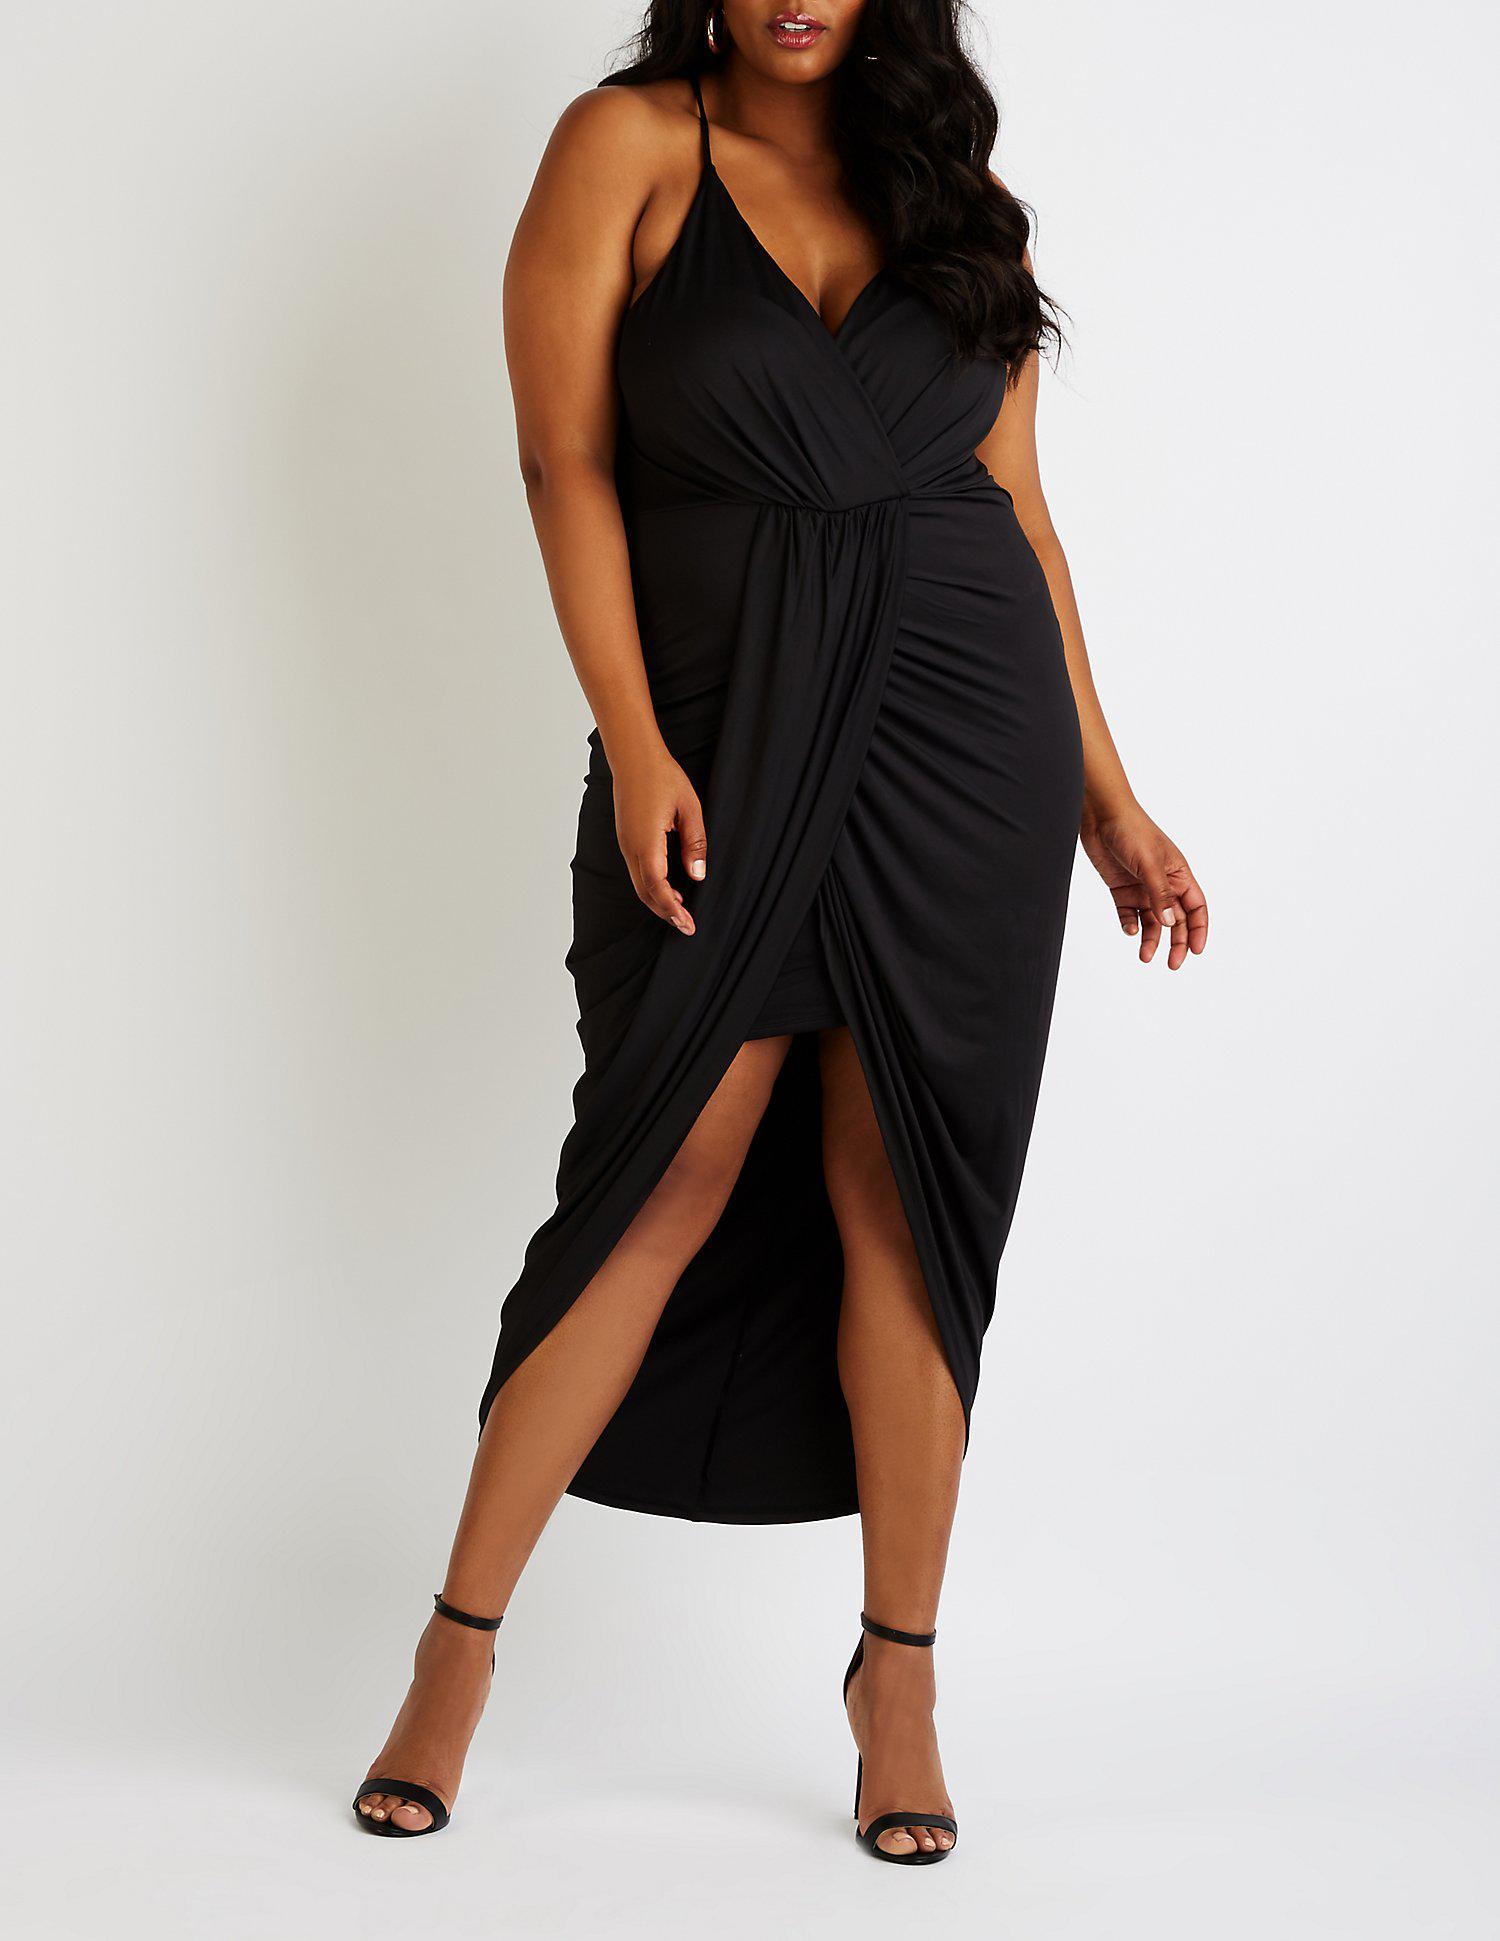 Lyst - Charlotte Russe Plus Size Wrap Maxi Dress in Black